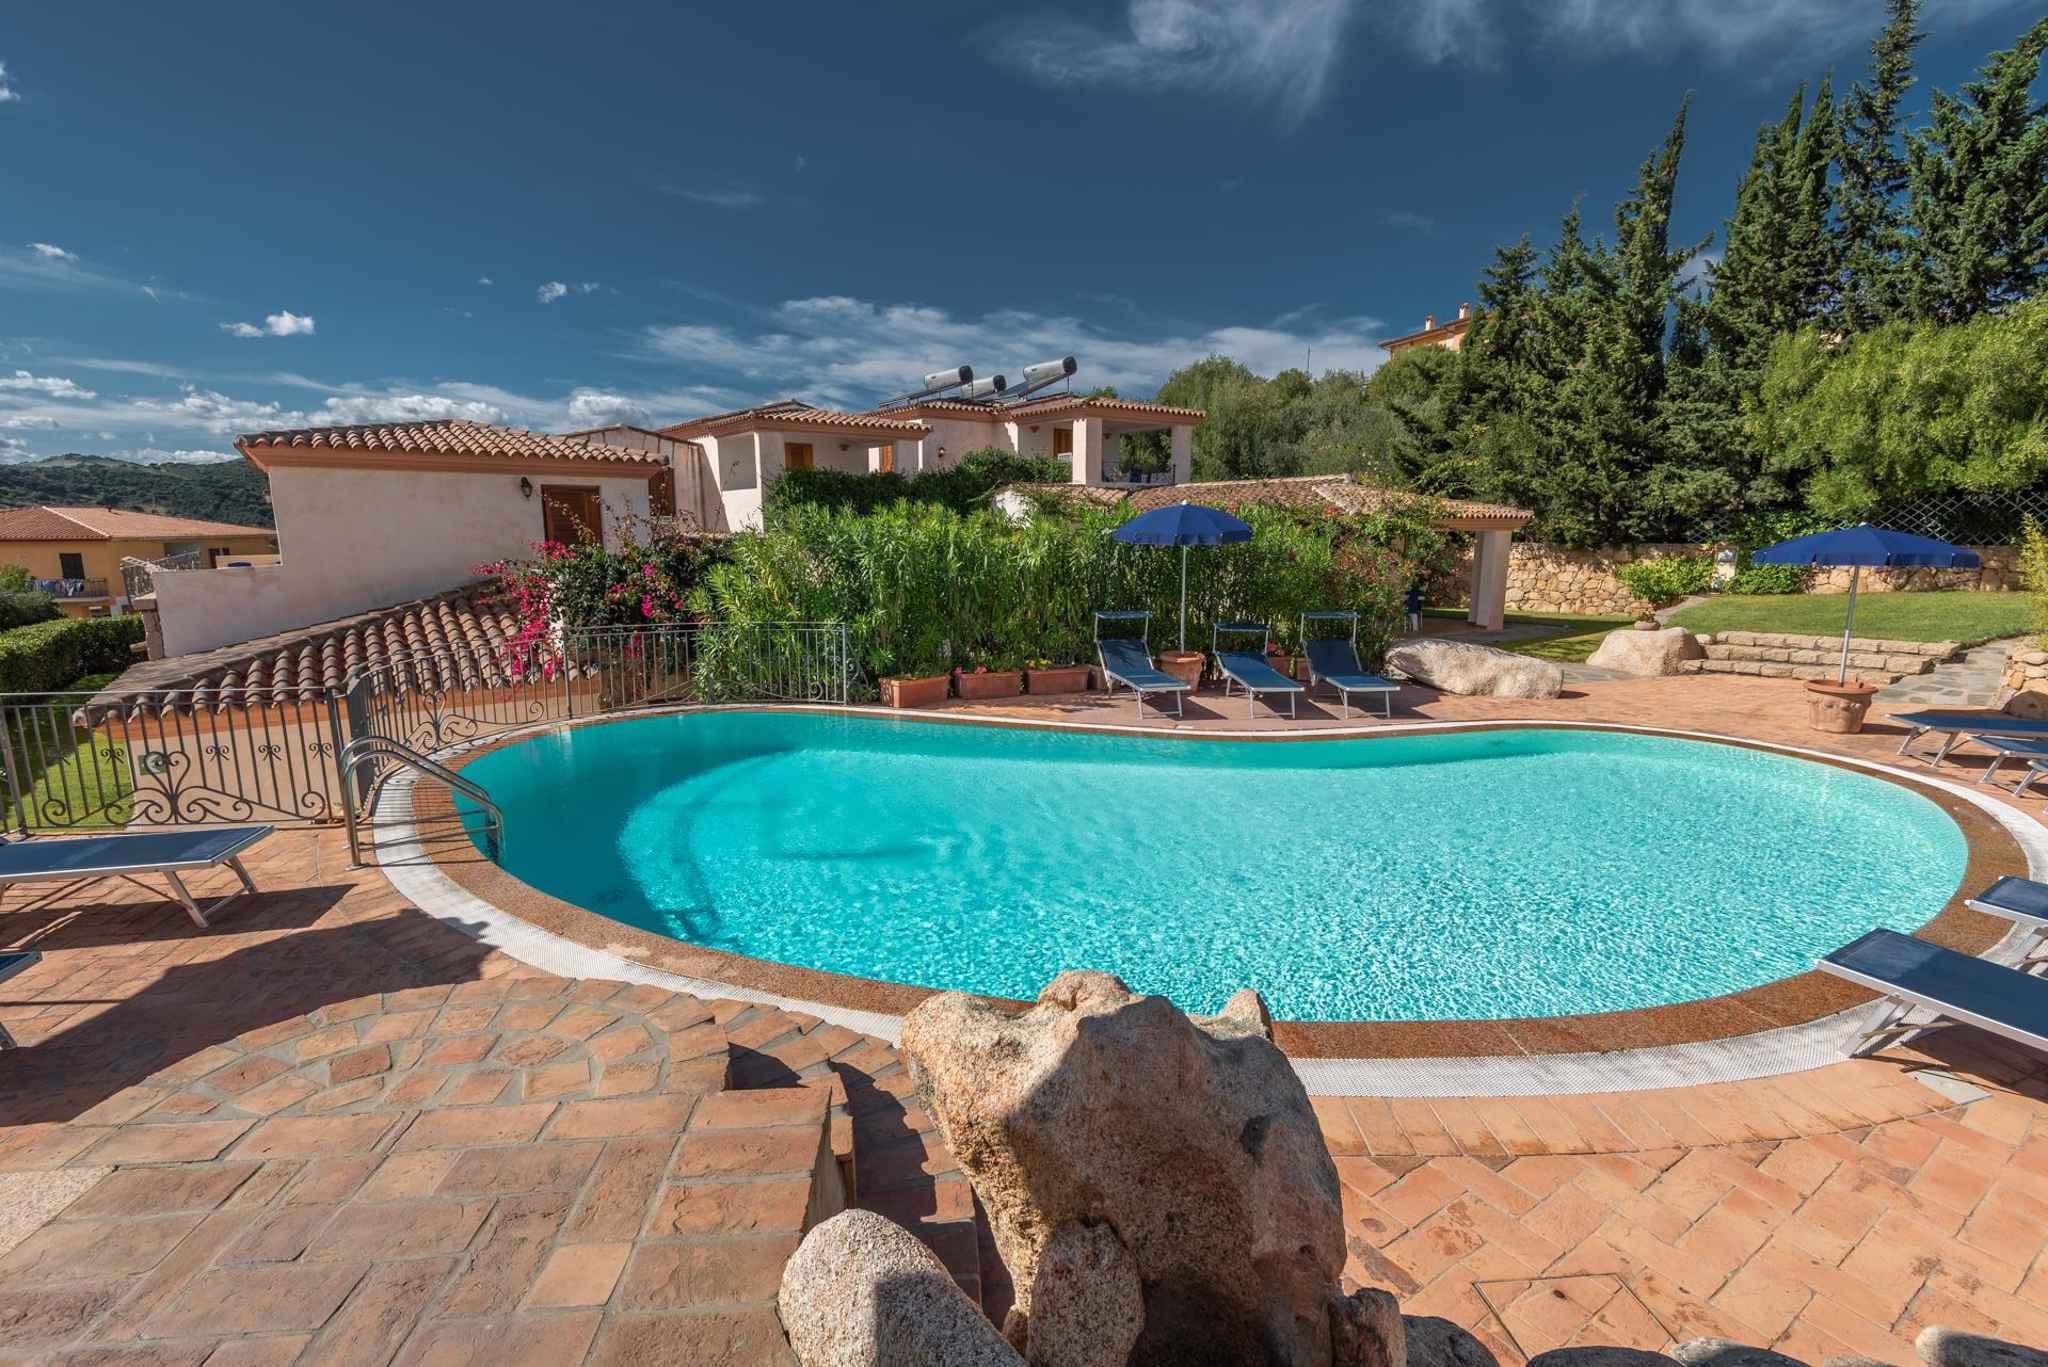 Ferienwohnung con piscina ed aria condizionata (2218559), Budoni, Olbia-Tempio, Sardinien, Italien, Bild 8